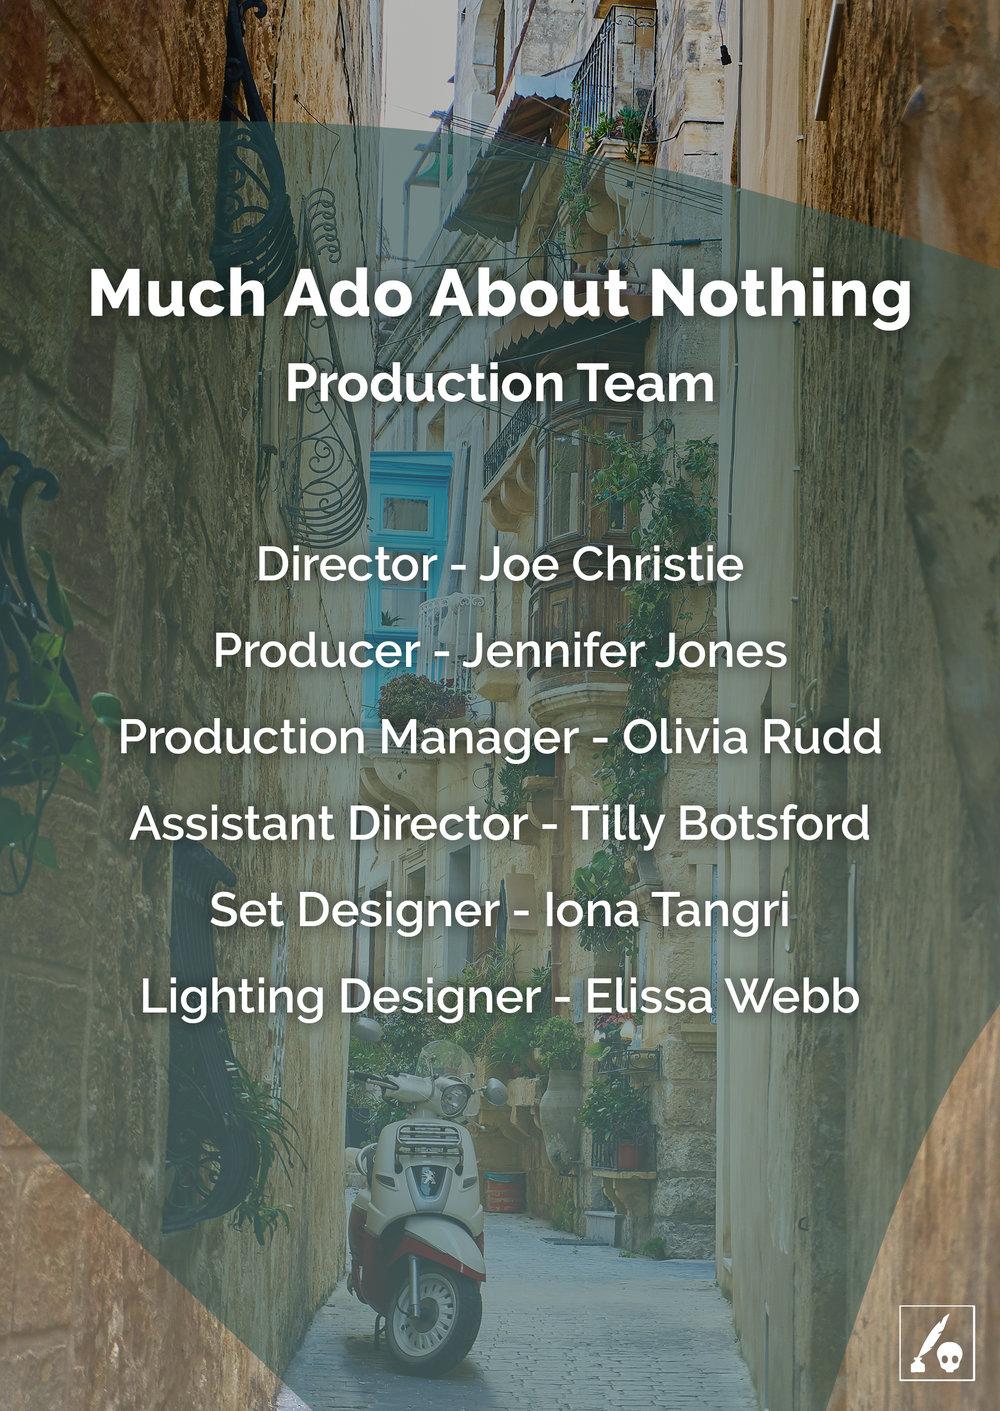 Much Ado prod team.jpg